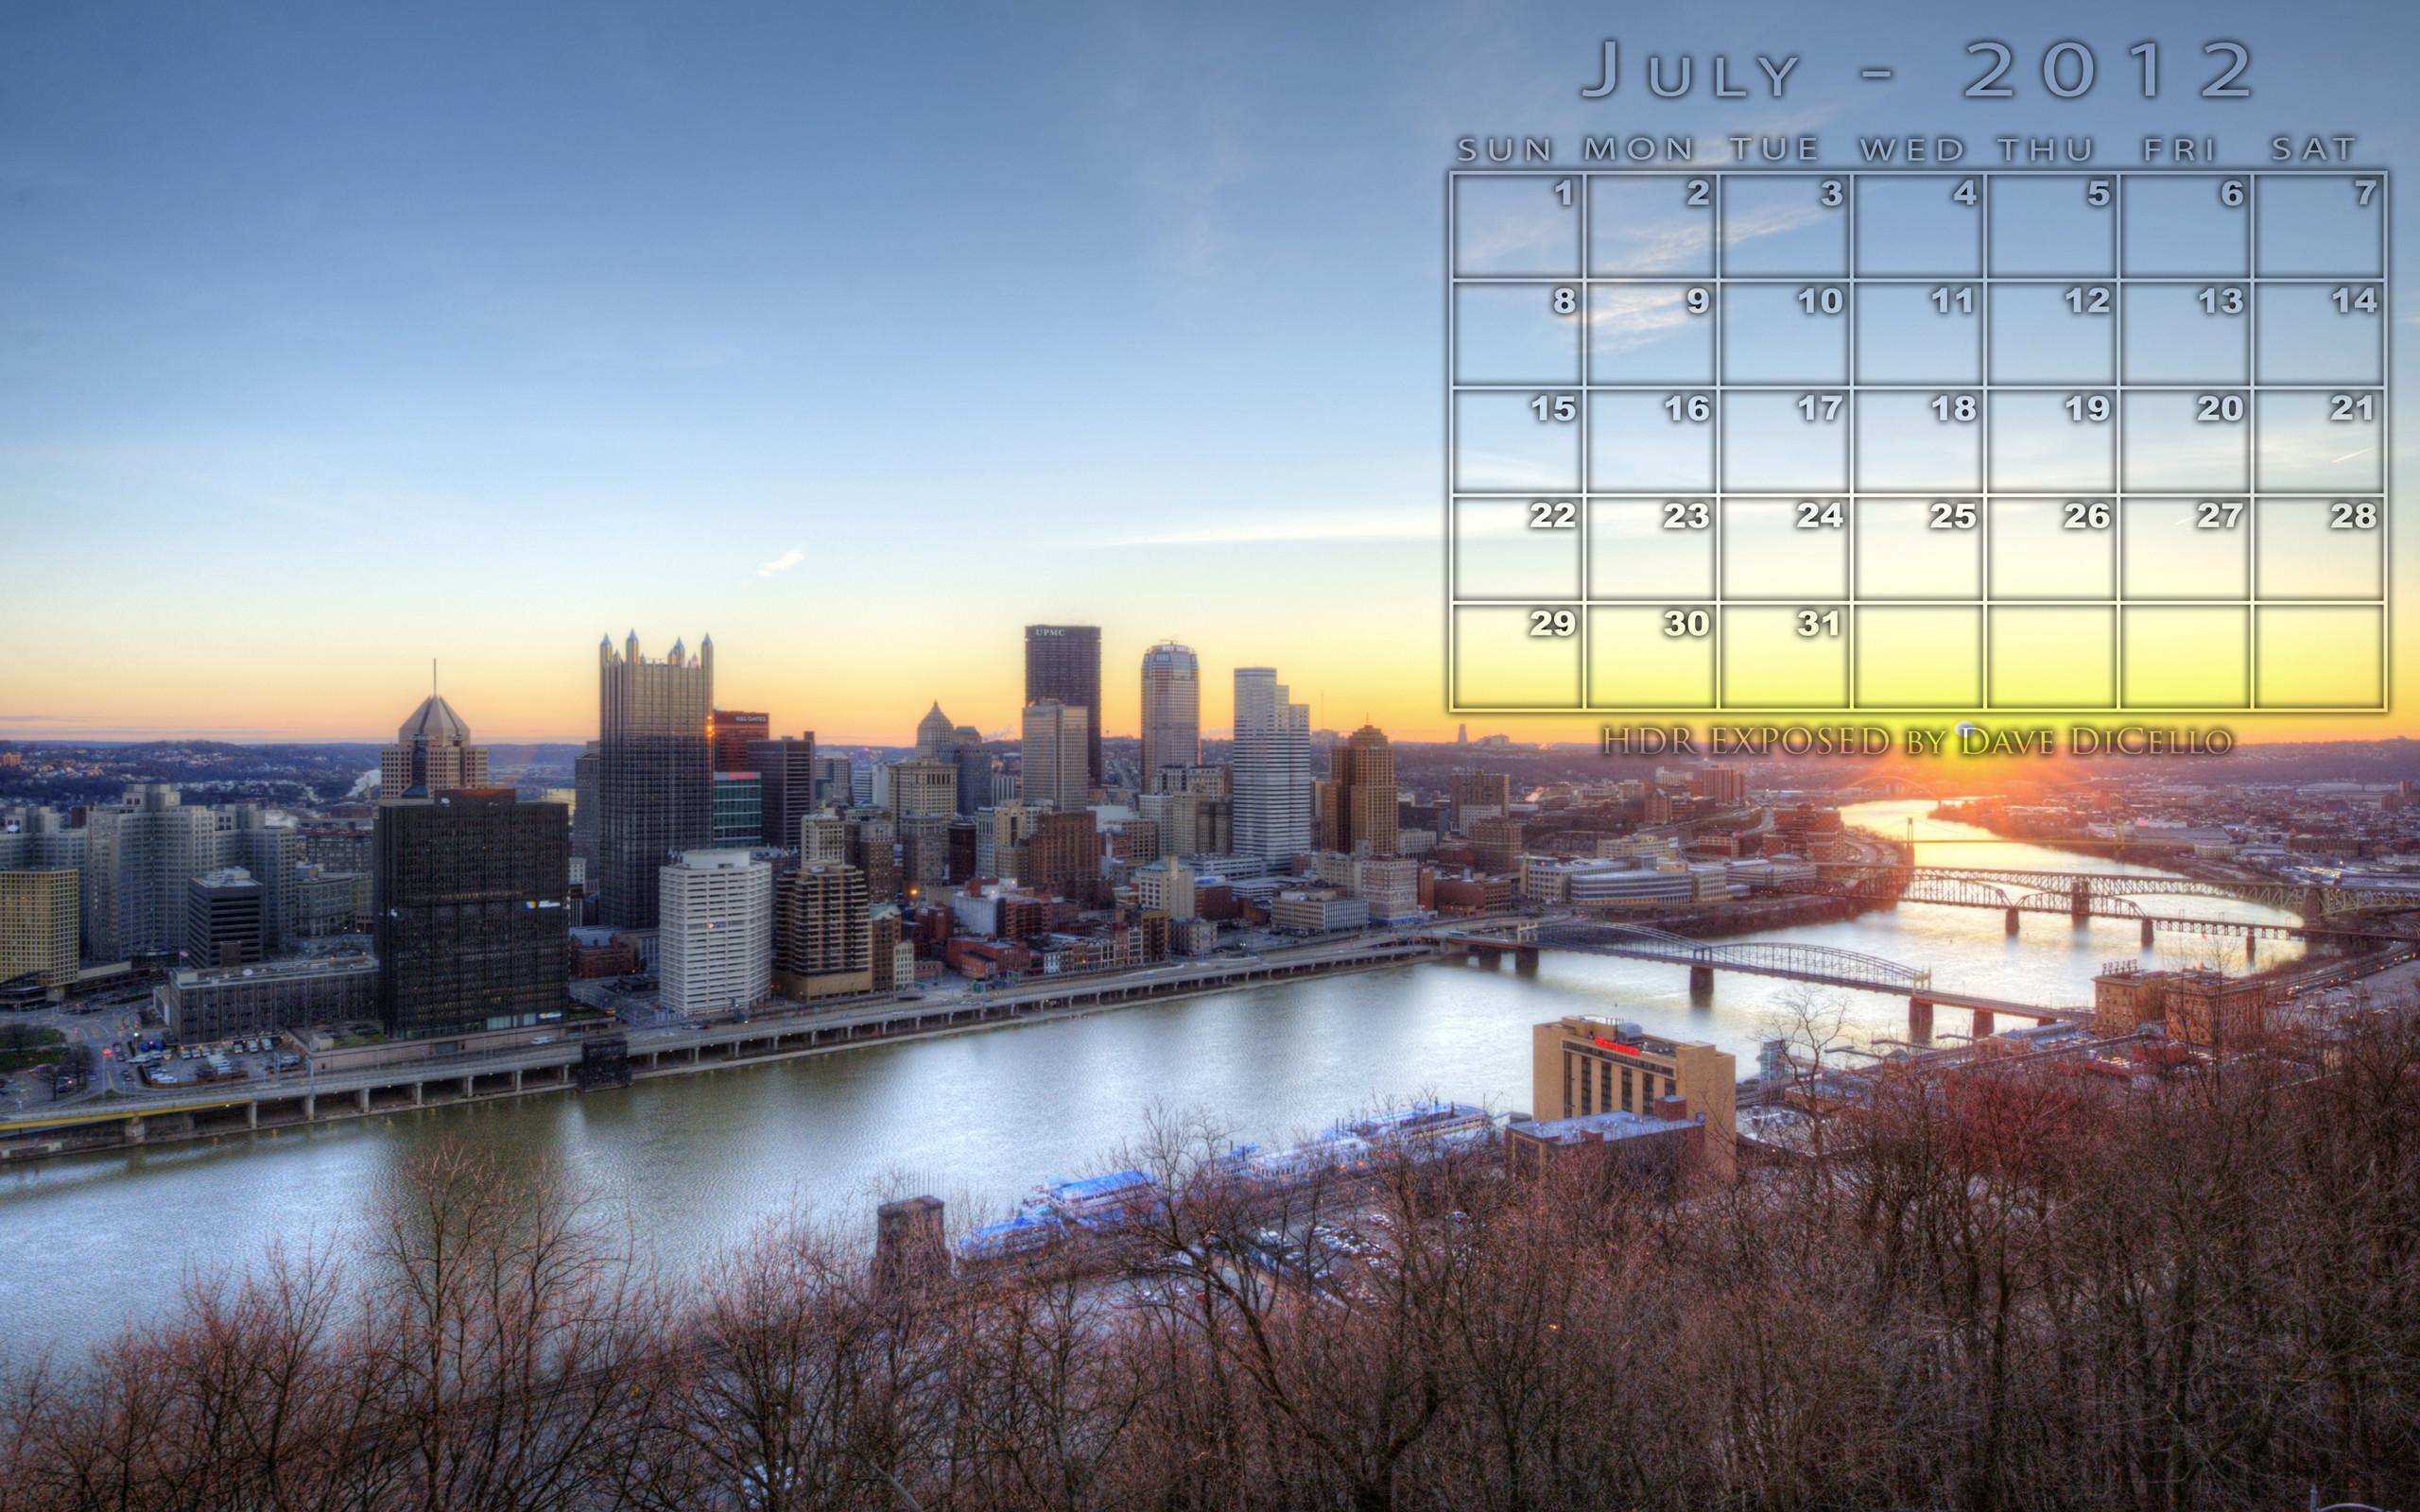 Pittsburgh Desktop Wallpaper Skyline: City Of Pittsburgh Wallpaper (62+ Images